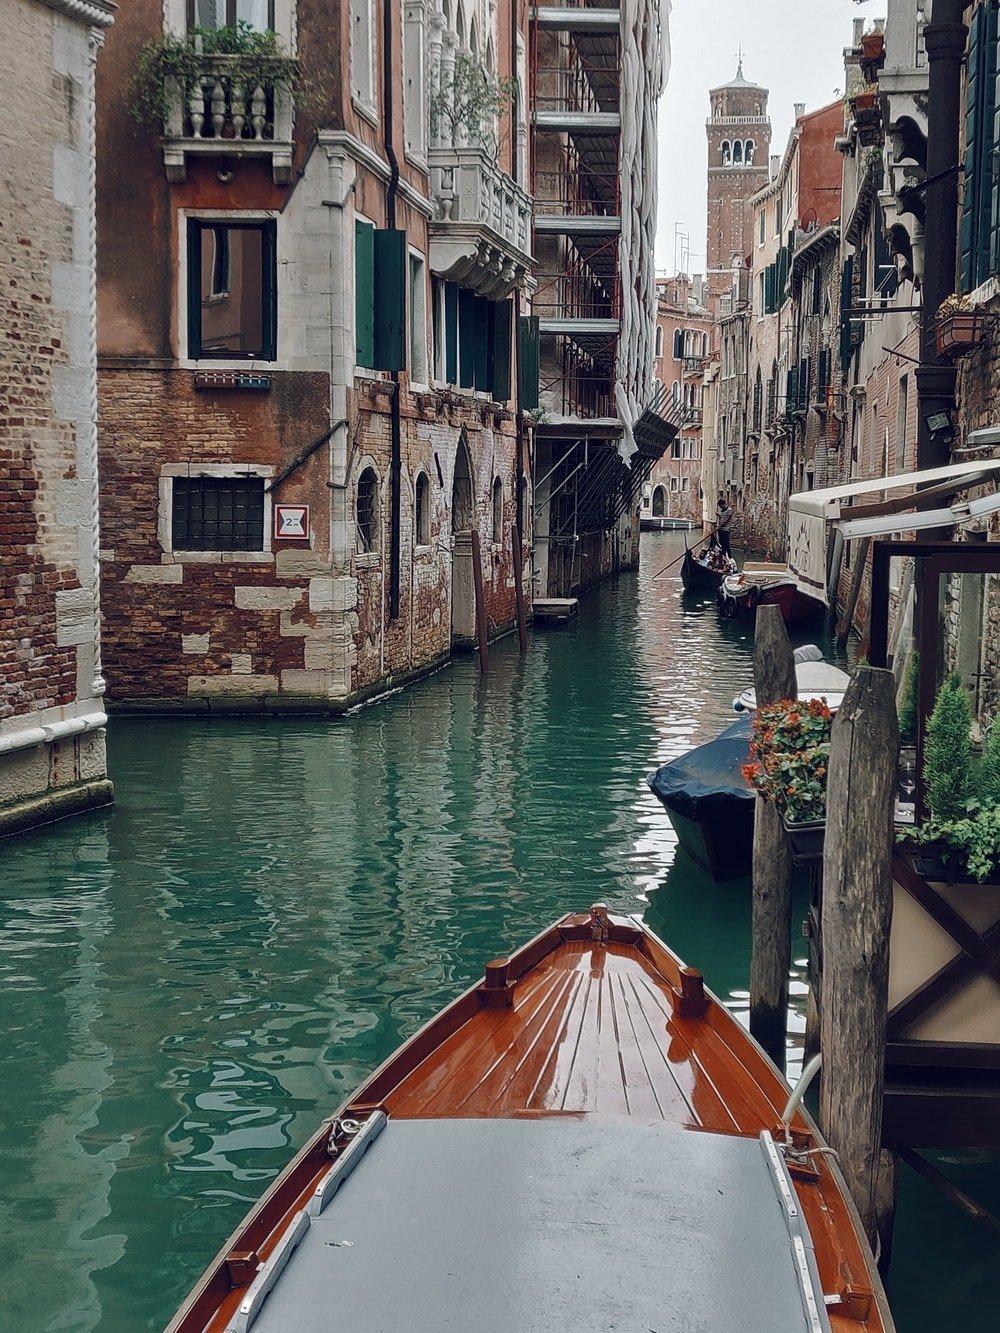 The Italian verb mancare